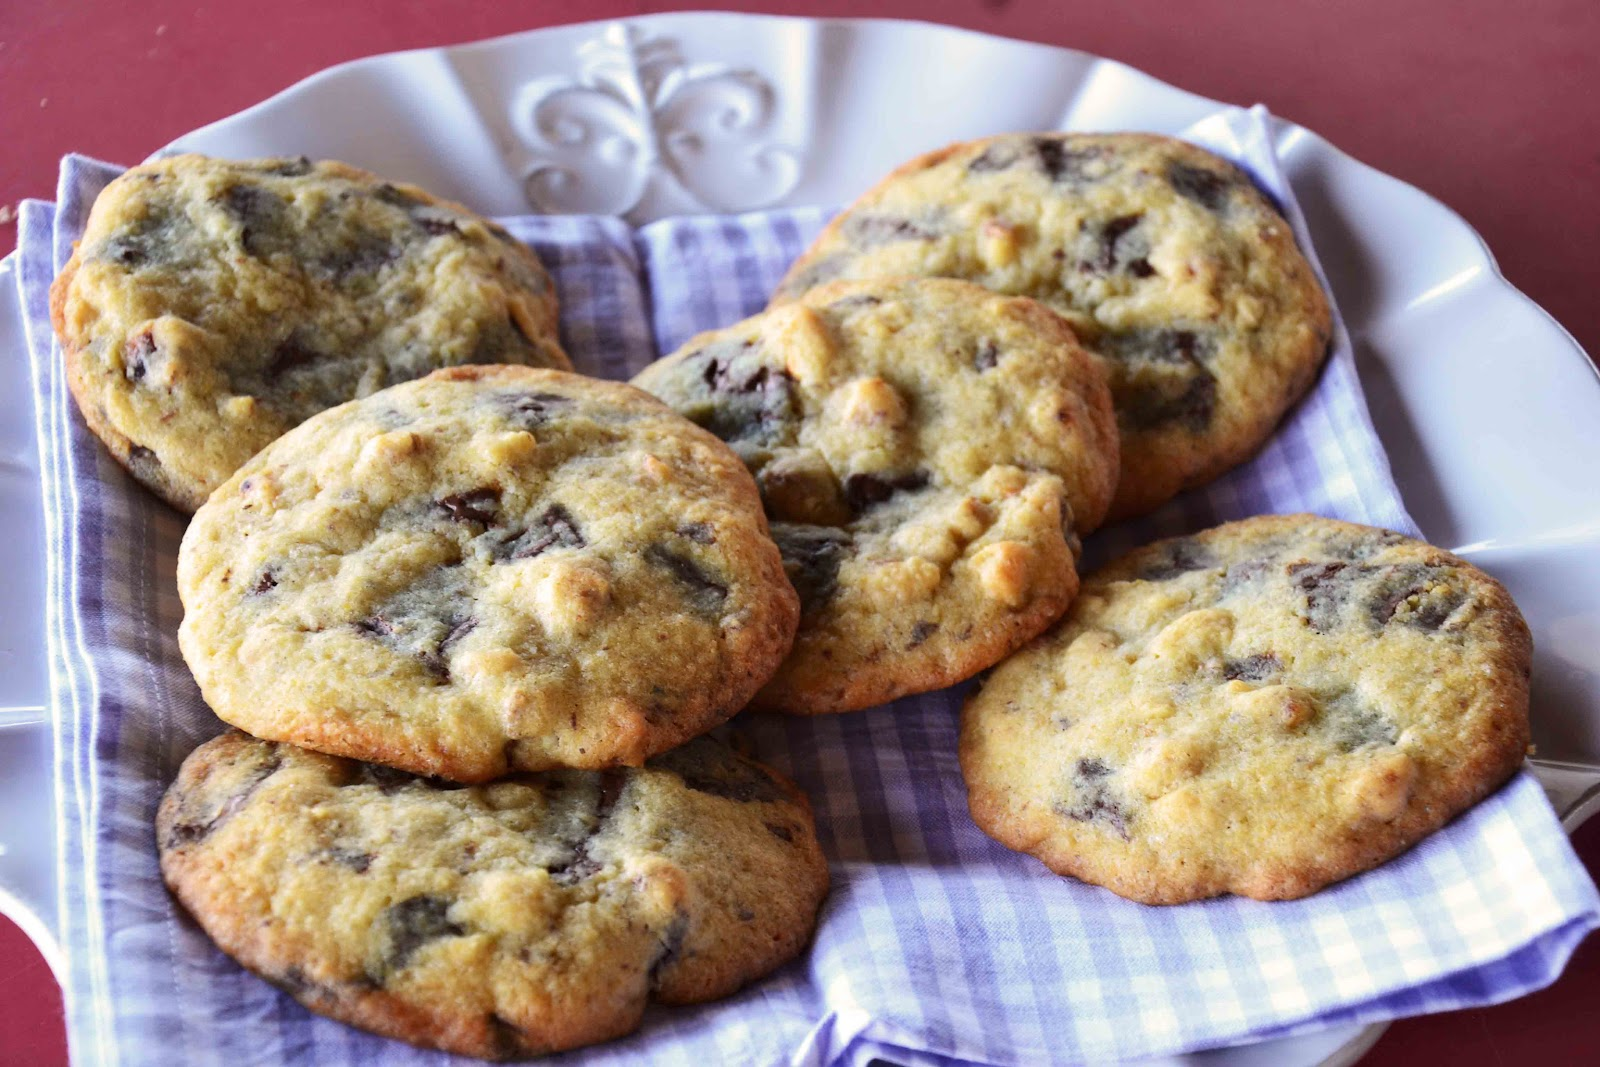 The eccentric Cook: Walnut Chocolate Chunk Cookies